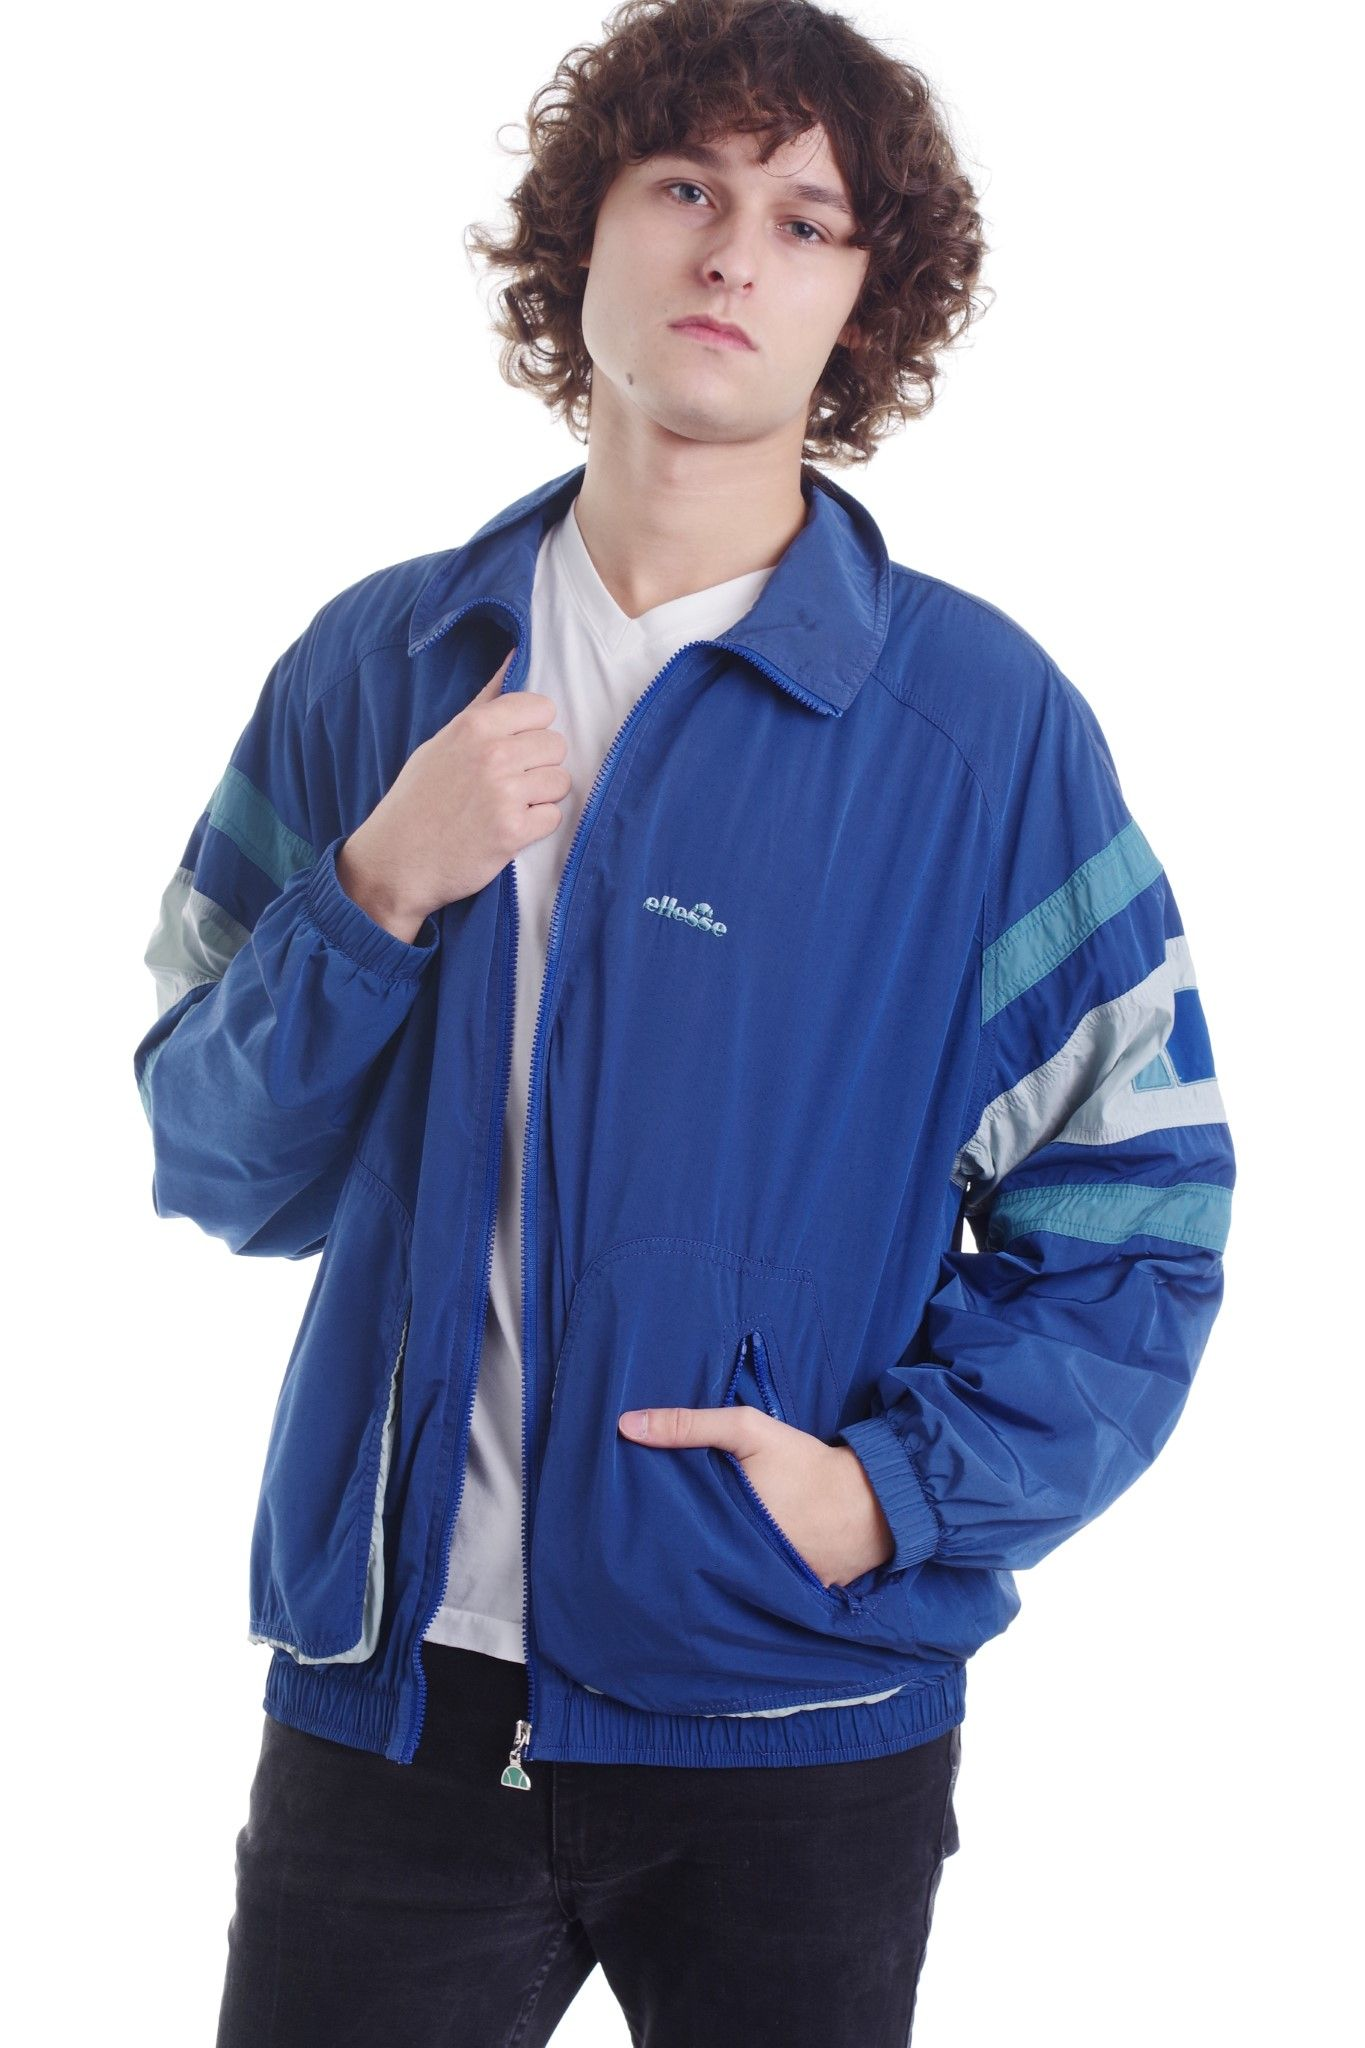 Ciemnoniebieska kurtka marki Ellesse - KEX Vintage Store | JestemSlow.pl